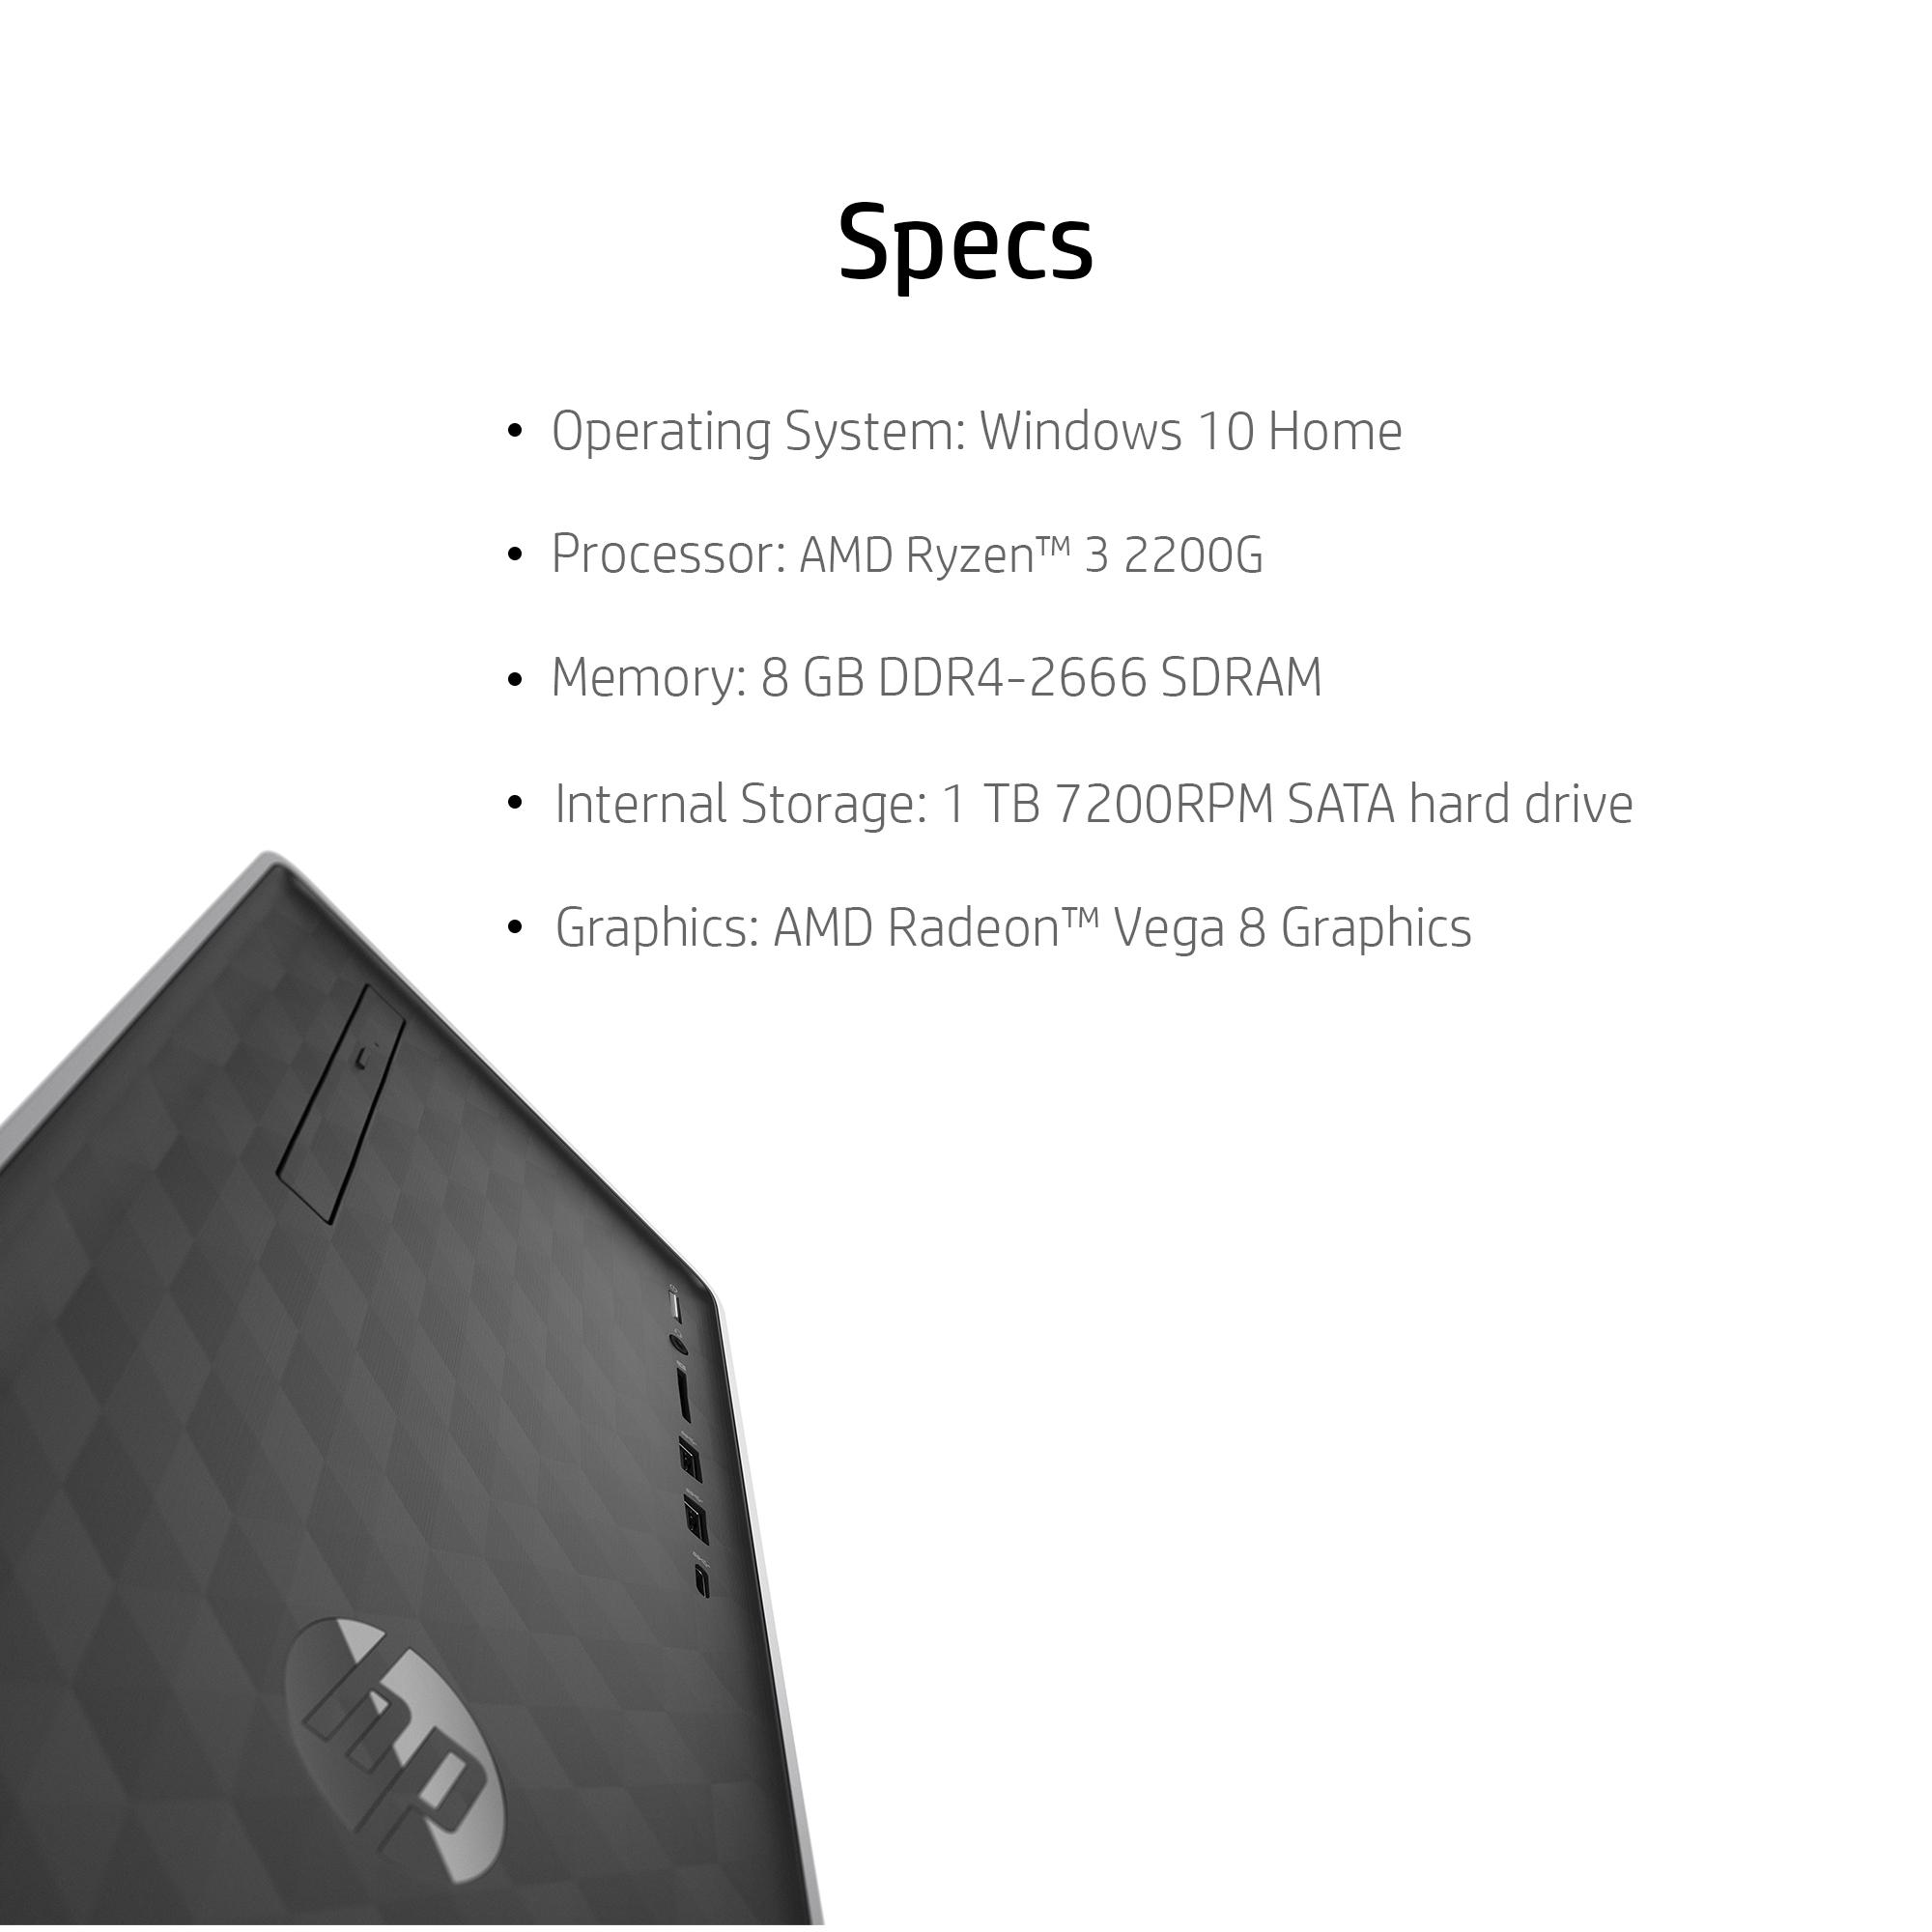 Hp Desktop And 23 8 Monitor Bundle Amd Ryzen 3 2200g Amd Radeon Vega 8 Graphics 8gb Sdram 1tb Hdd Dvd 590 P0103wb Walmart Com Walmart Com